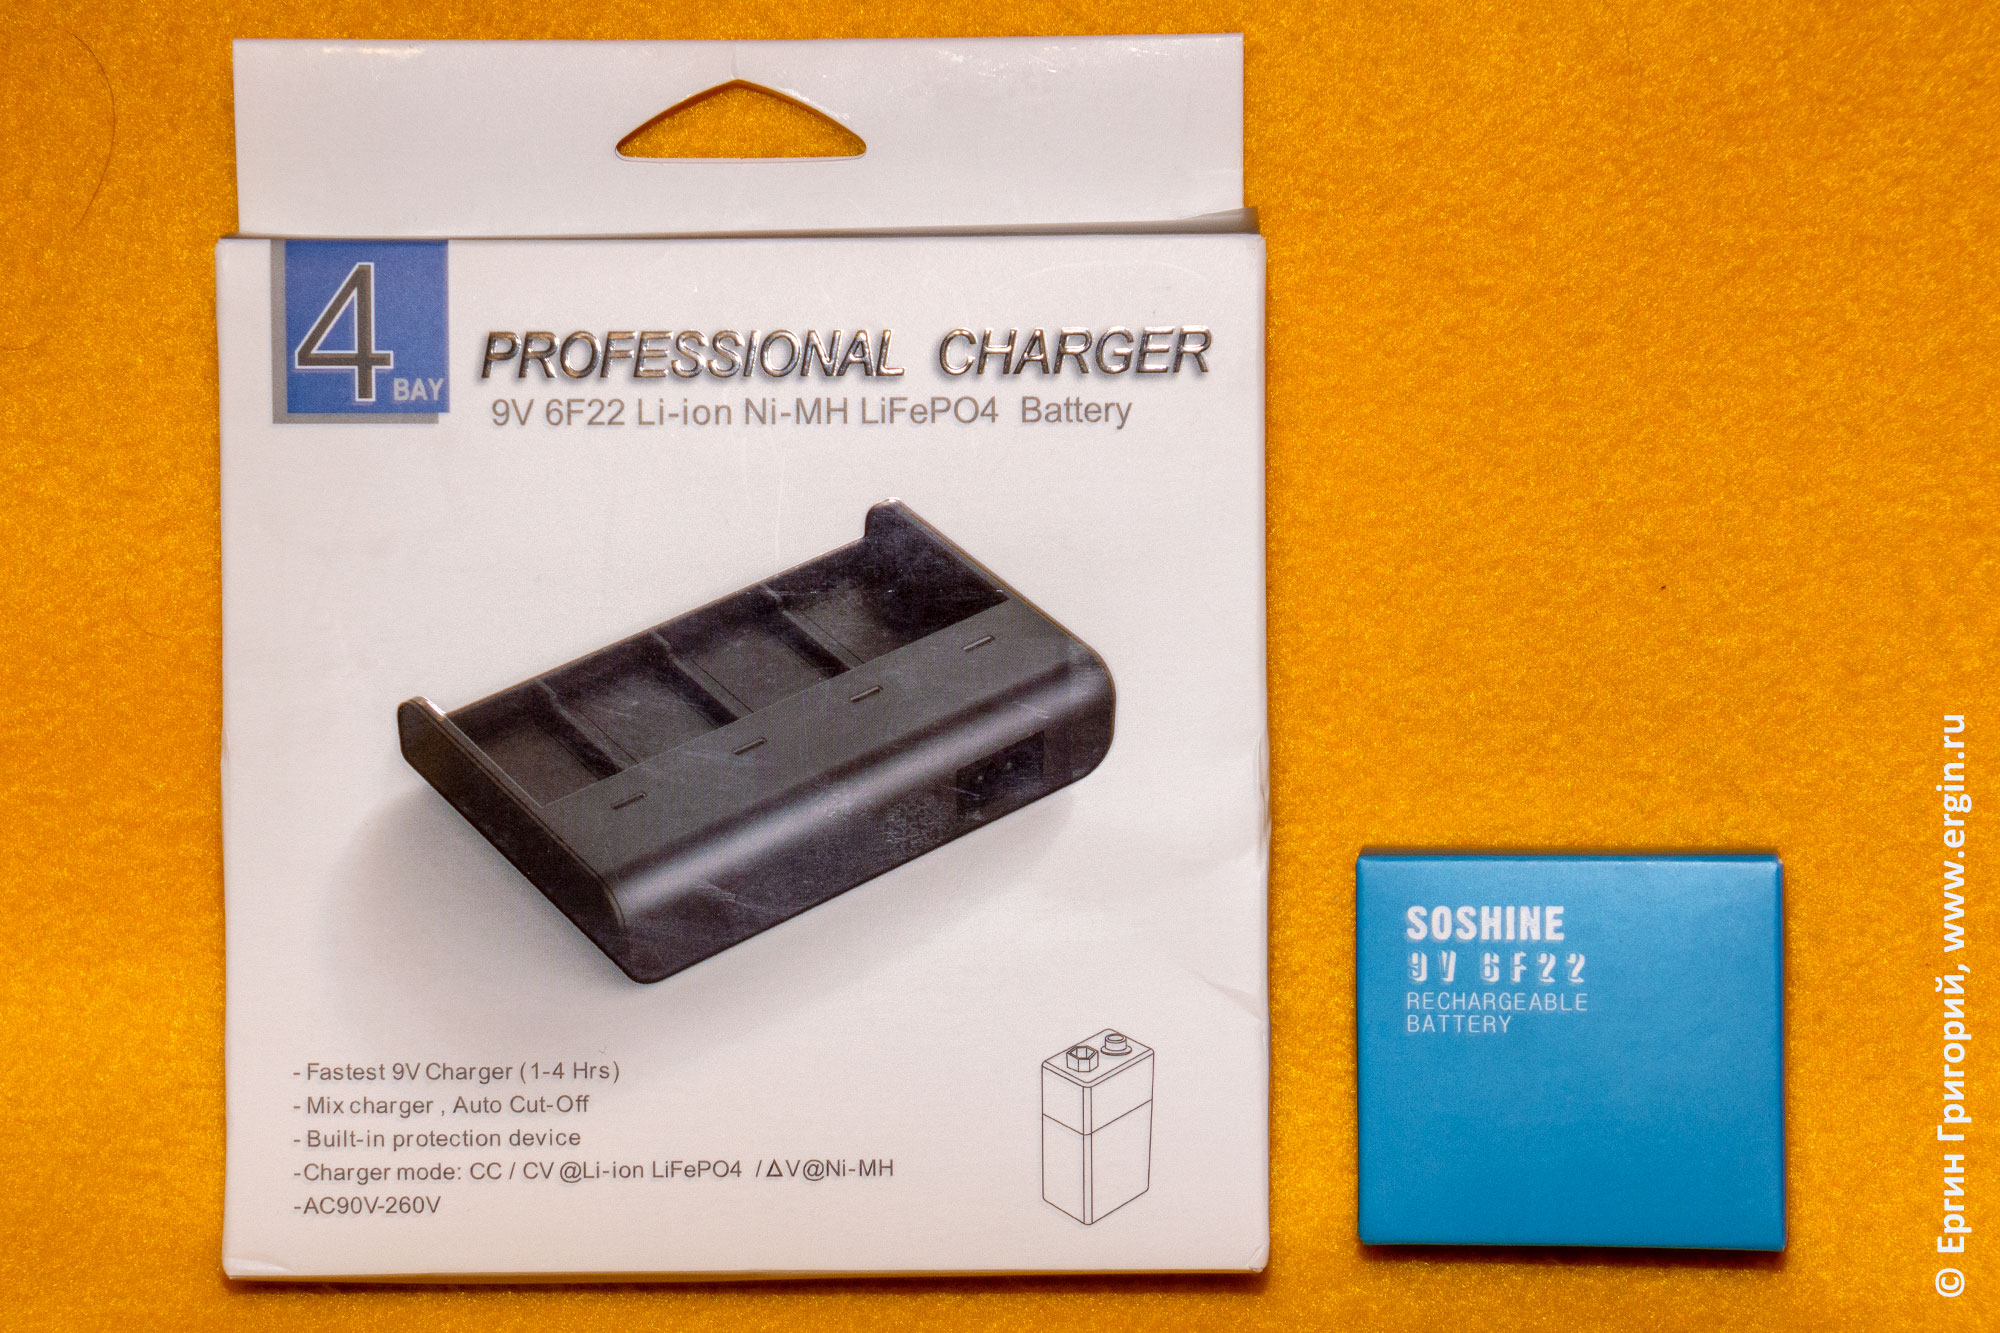 Аккумуляторы типа крона Li-ion фирмы Soshine и оригинальная зарядка на 4 аккумулятора